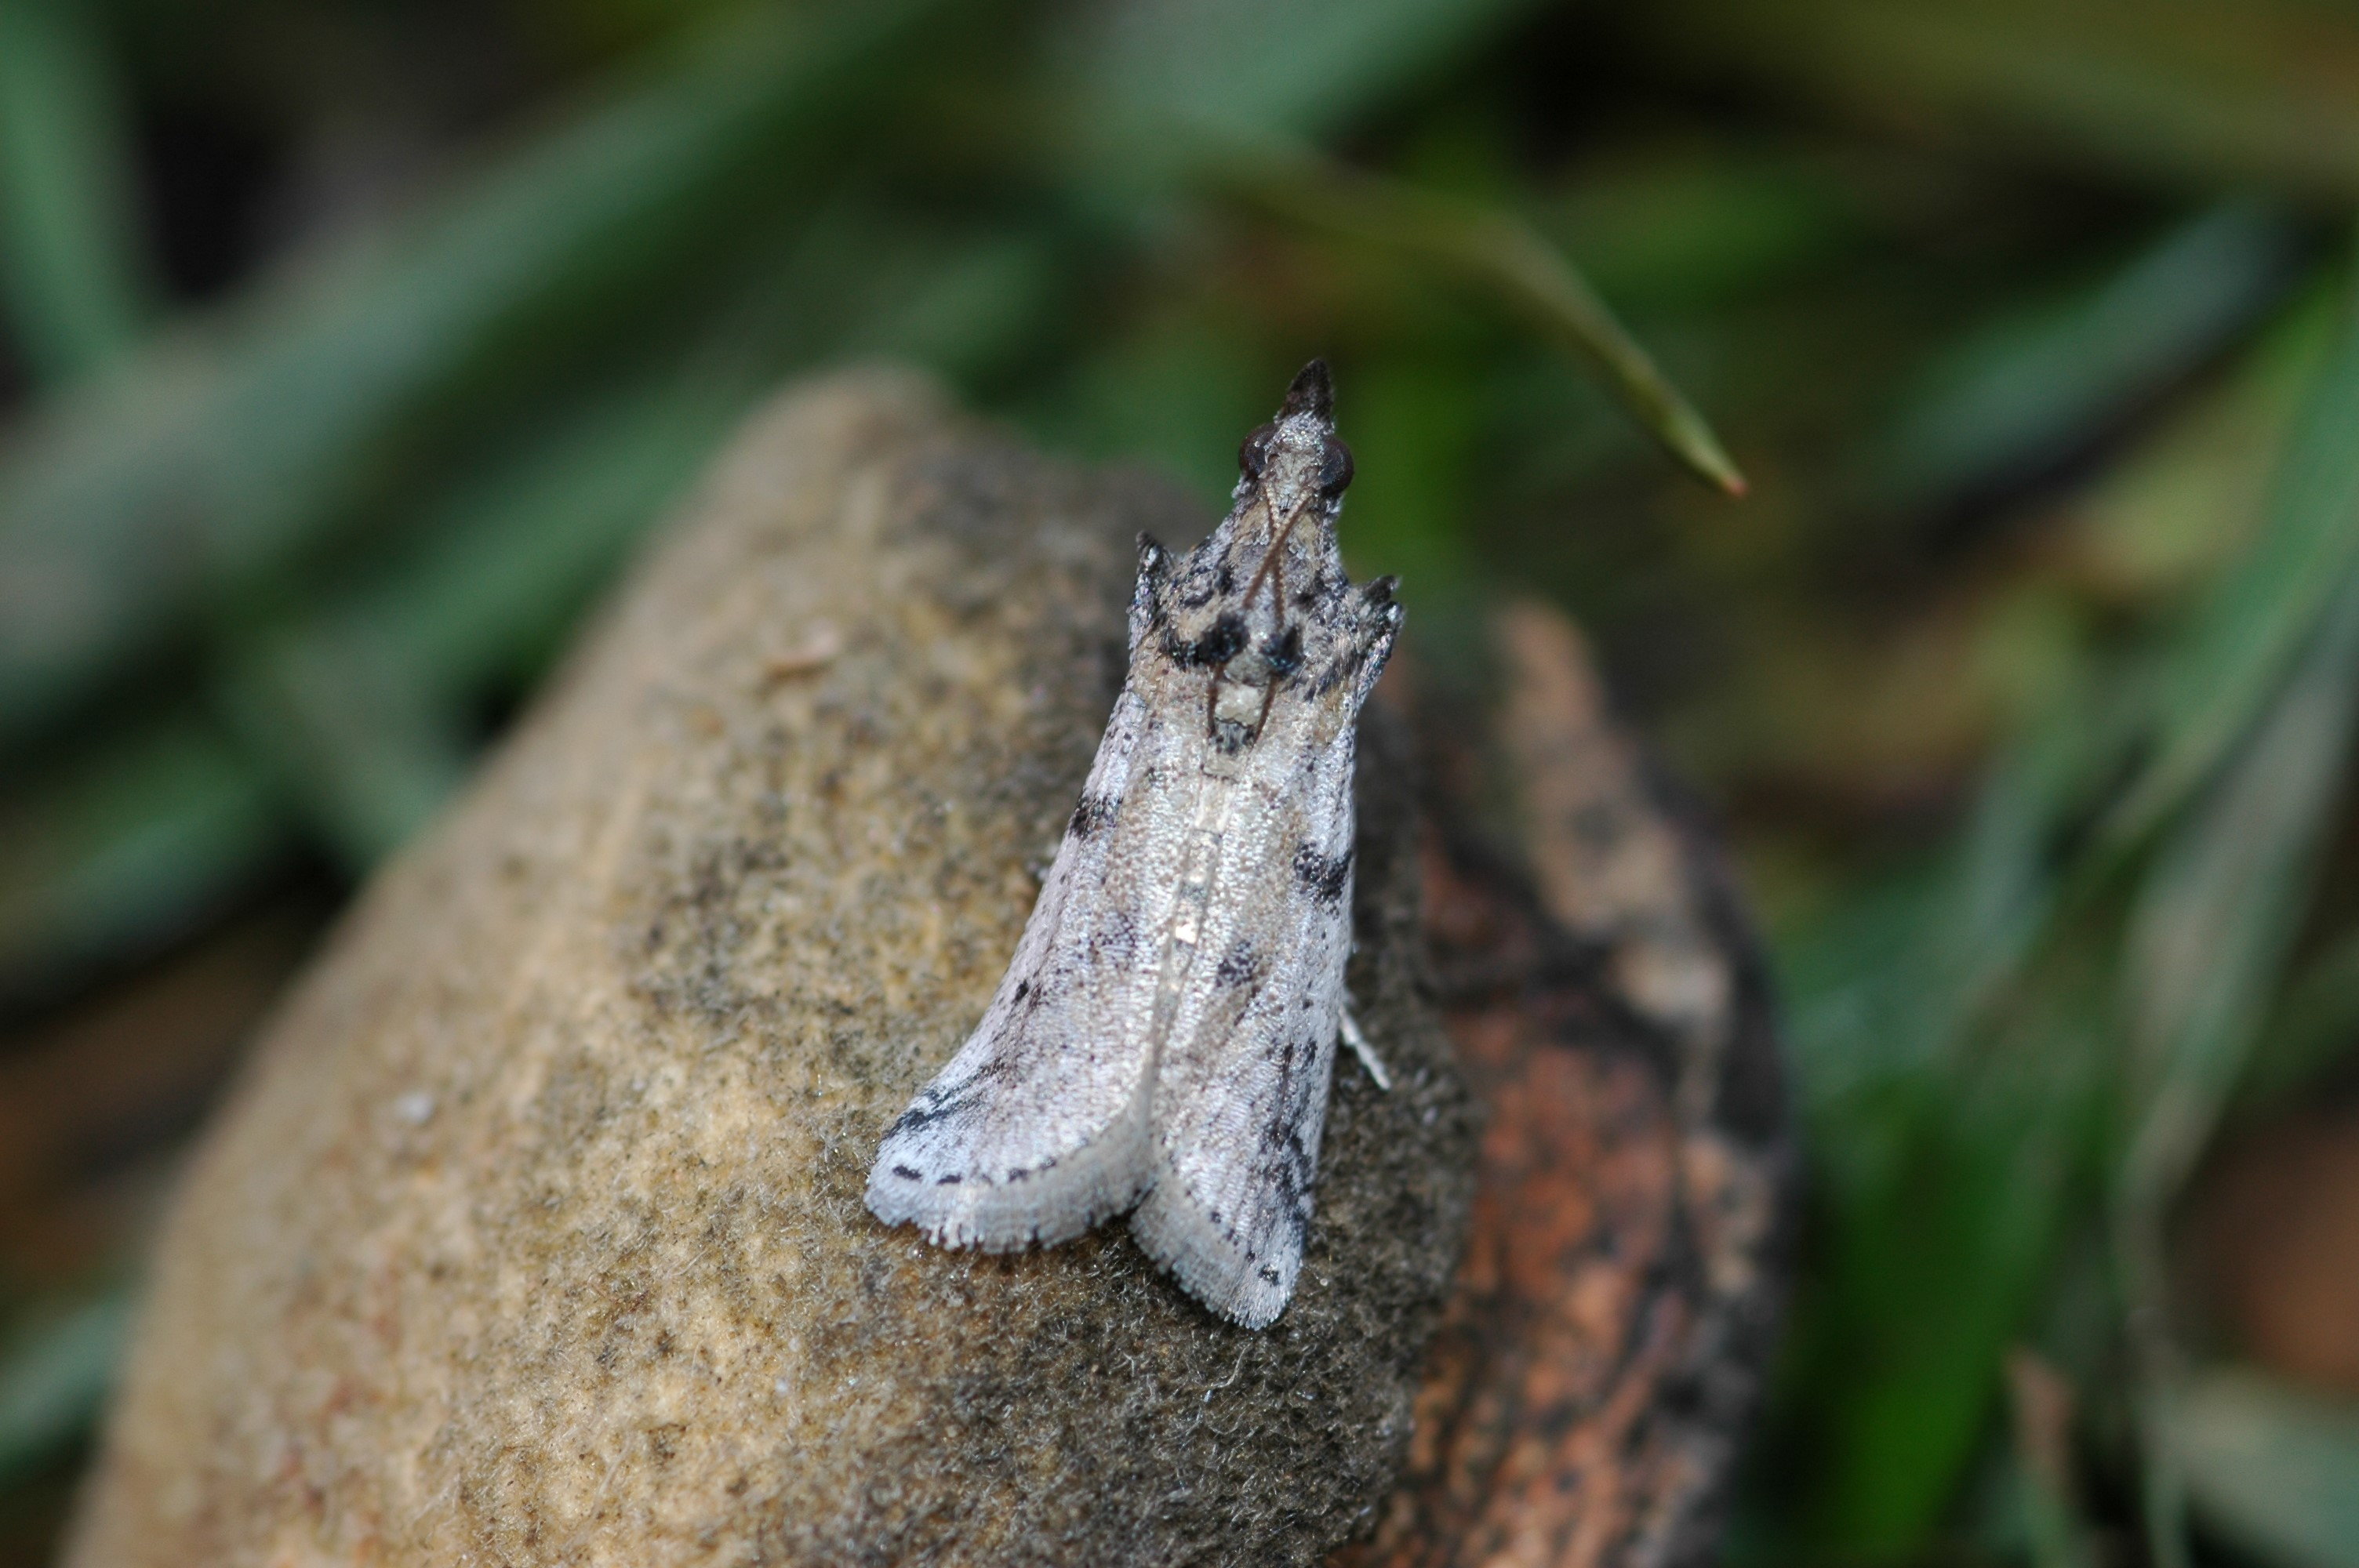 This agronomic image shows naval orangeworm moth